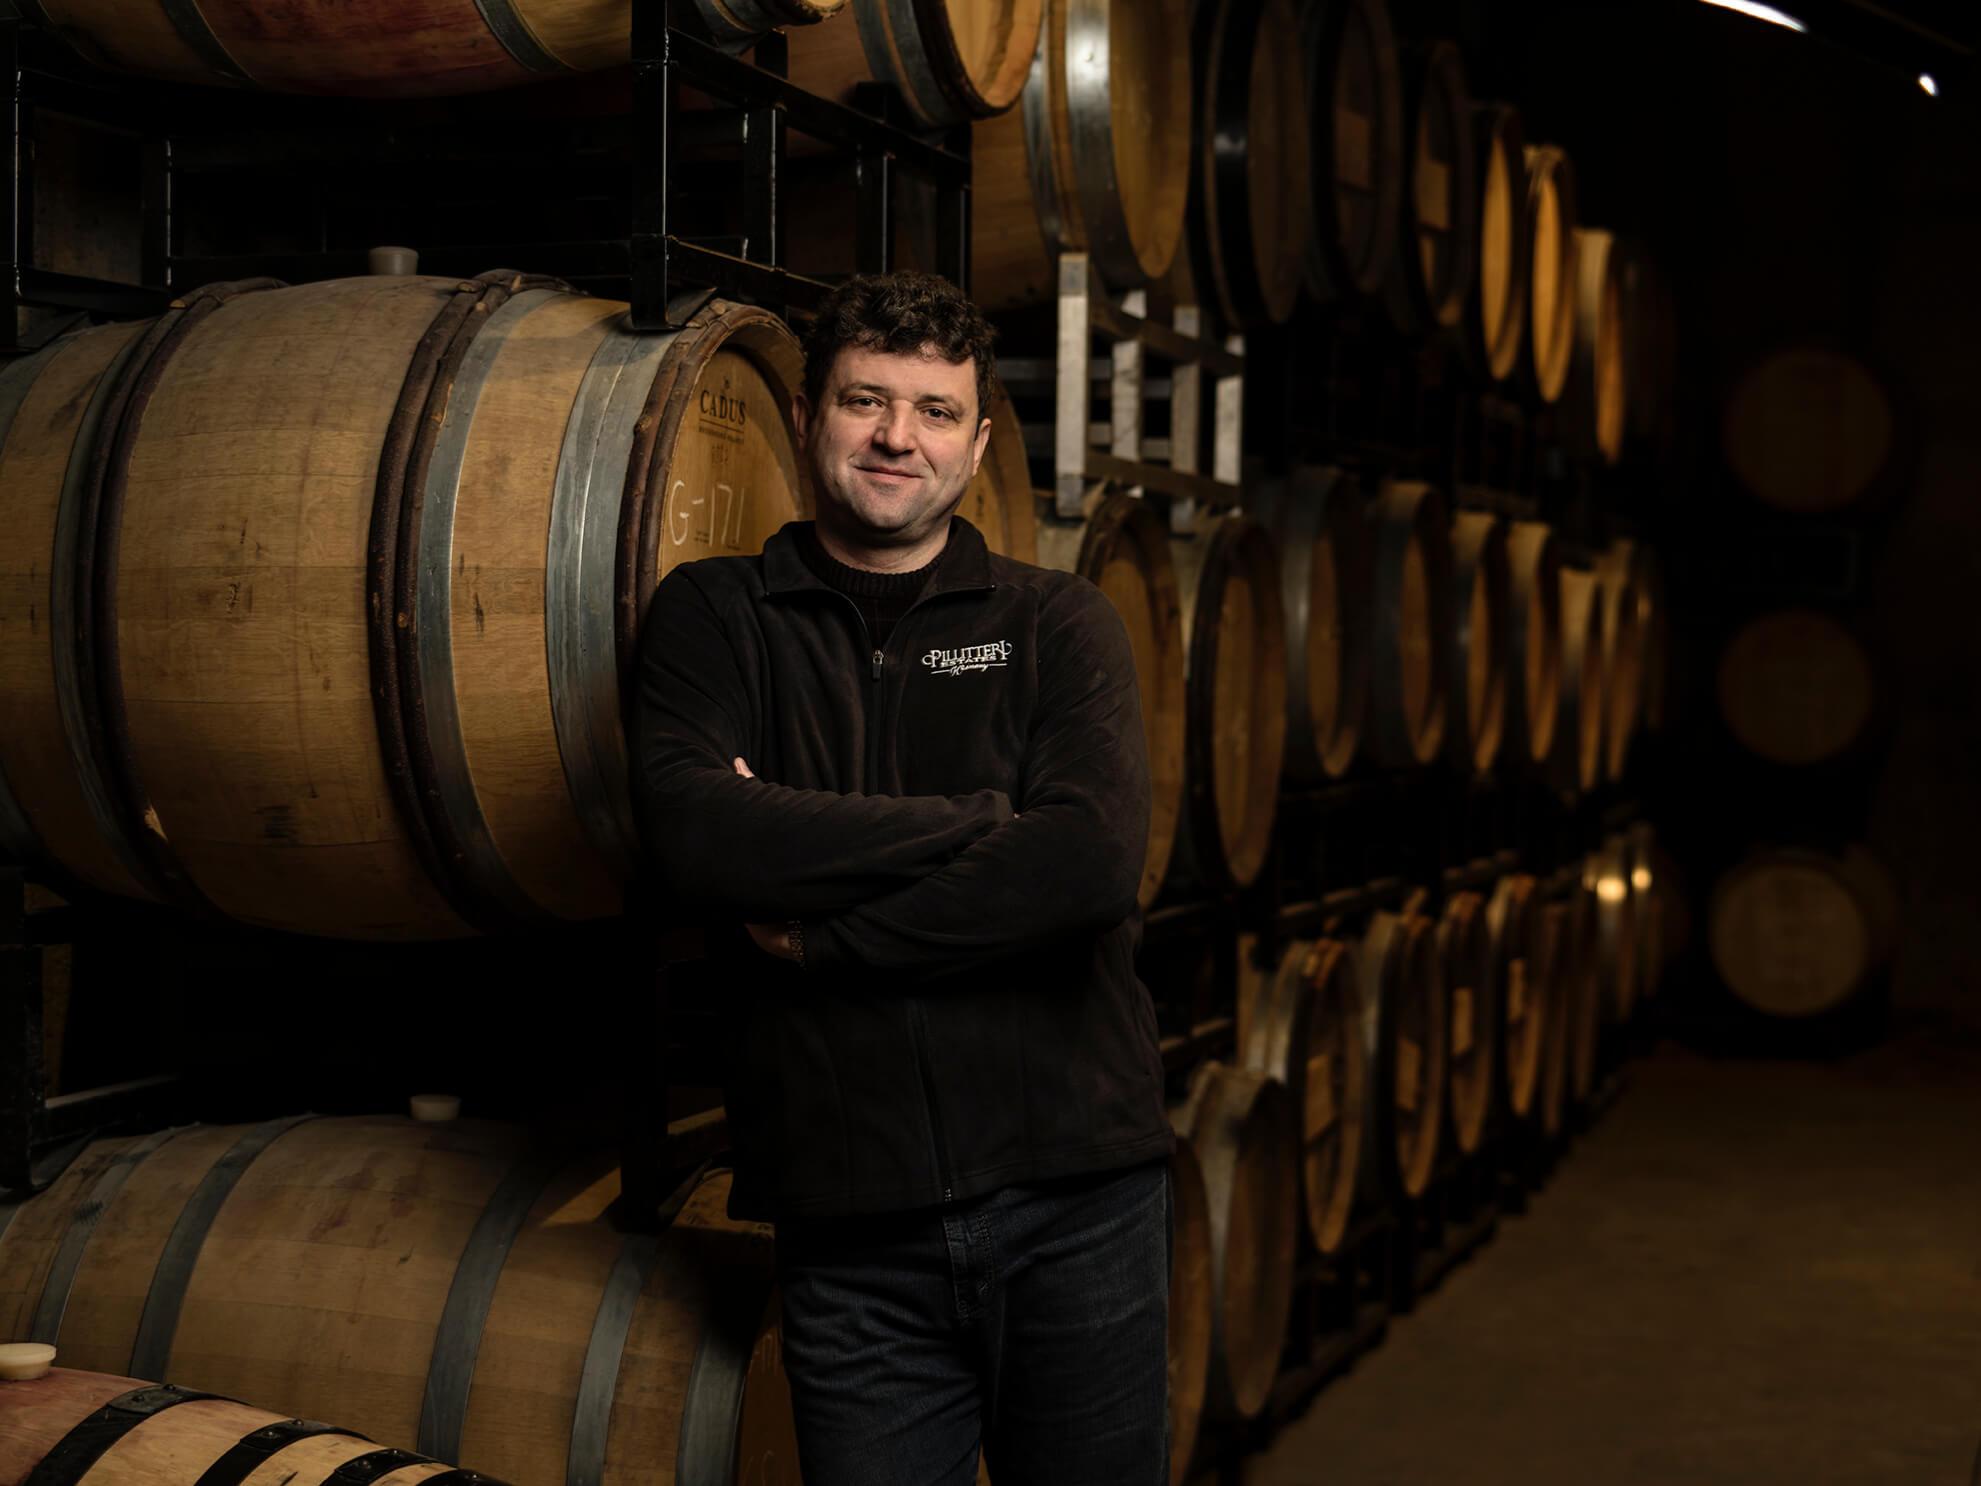 Unified Content, Unified Content Toronto, Max Rosenstein, Pillitteri Estates, Pillitteri Estates Winery, Winery, Niagra Wine, Niagra Region, Niagra, Wine, Canadian Wine, Wine Country, Niagra On The Lake Winery, portrait,